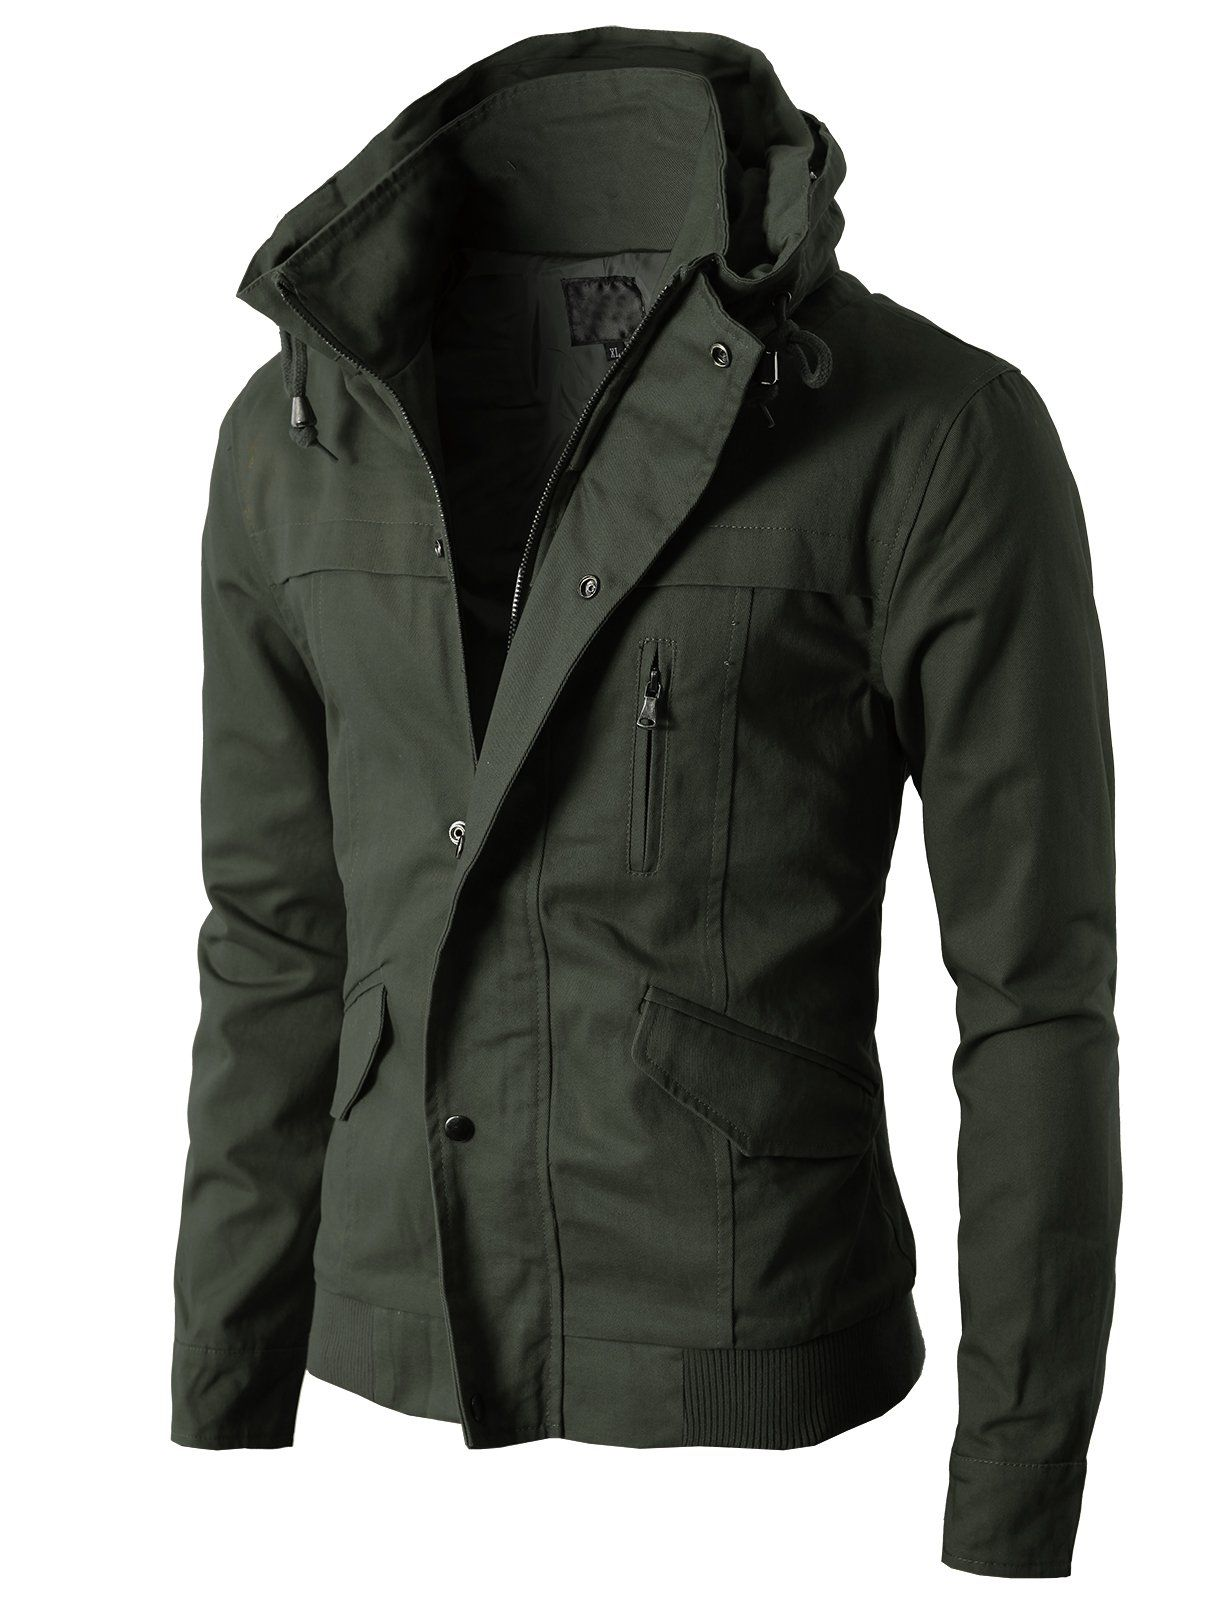 2a0a2b72 H2H Mens High-neck Field Jackets without Hood KHAKI Asia XL (KMOJA024)